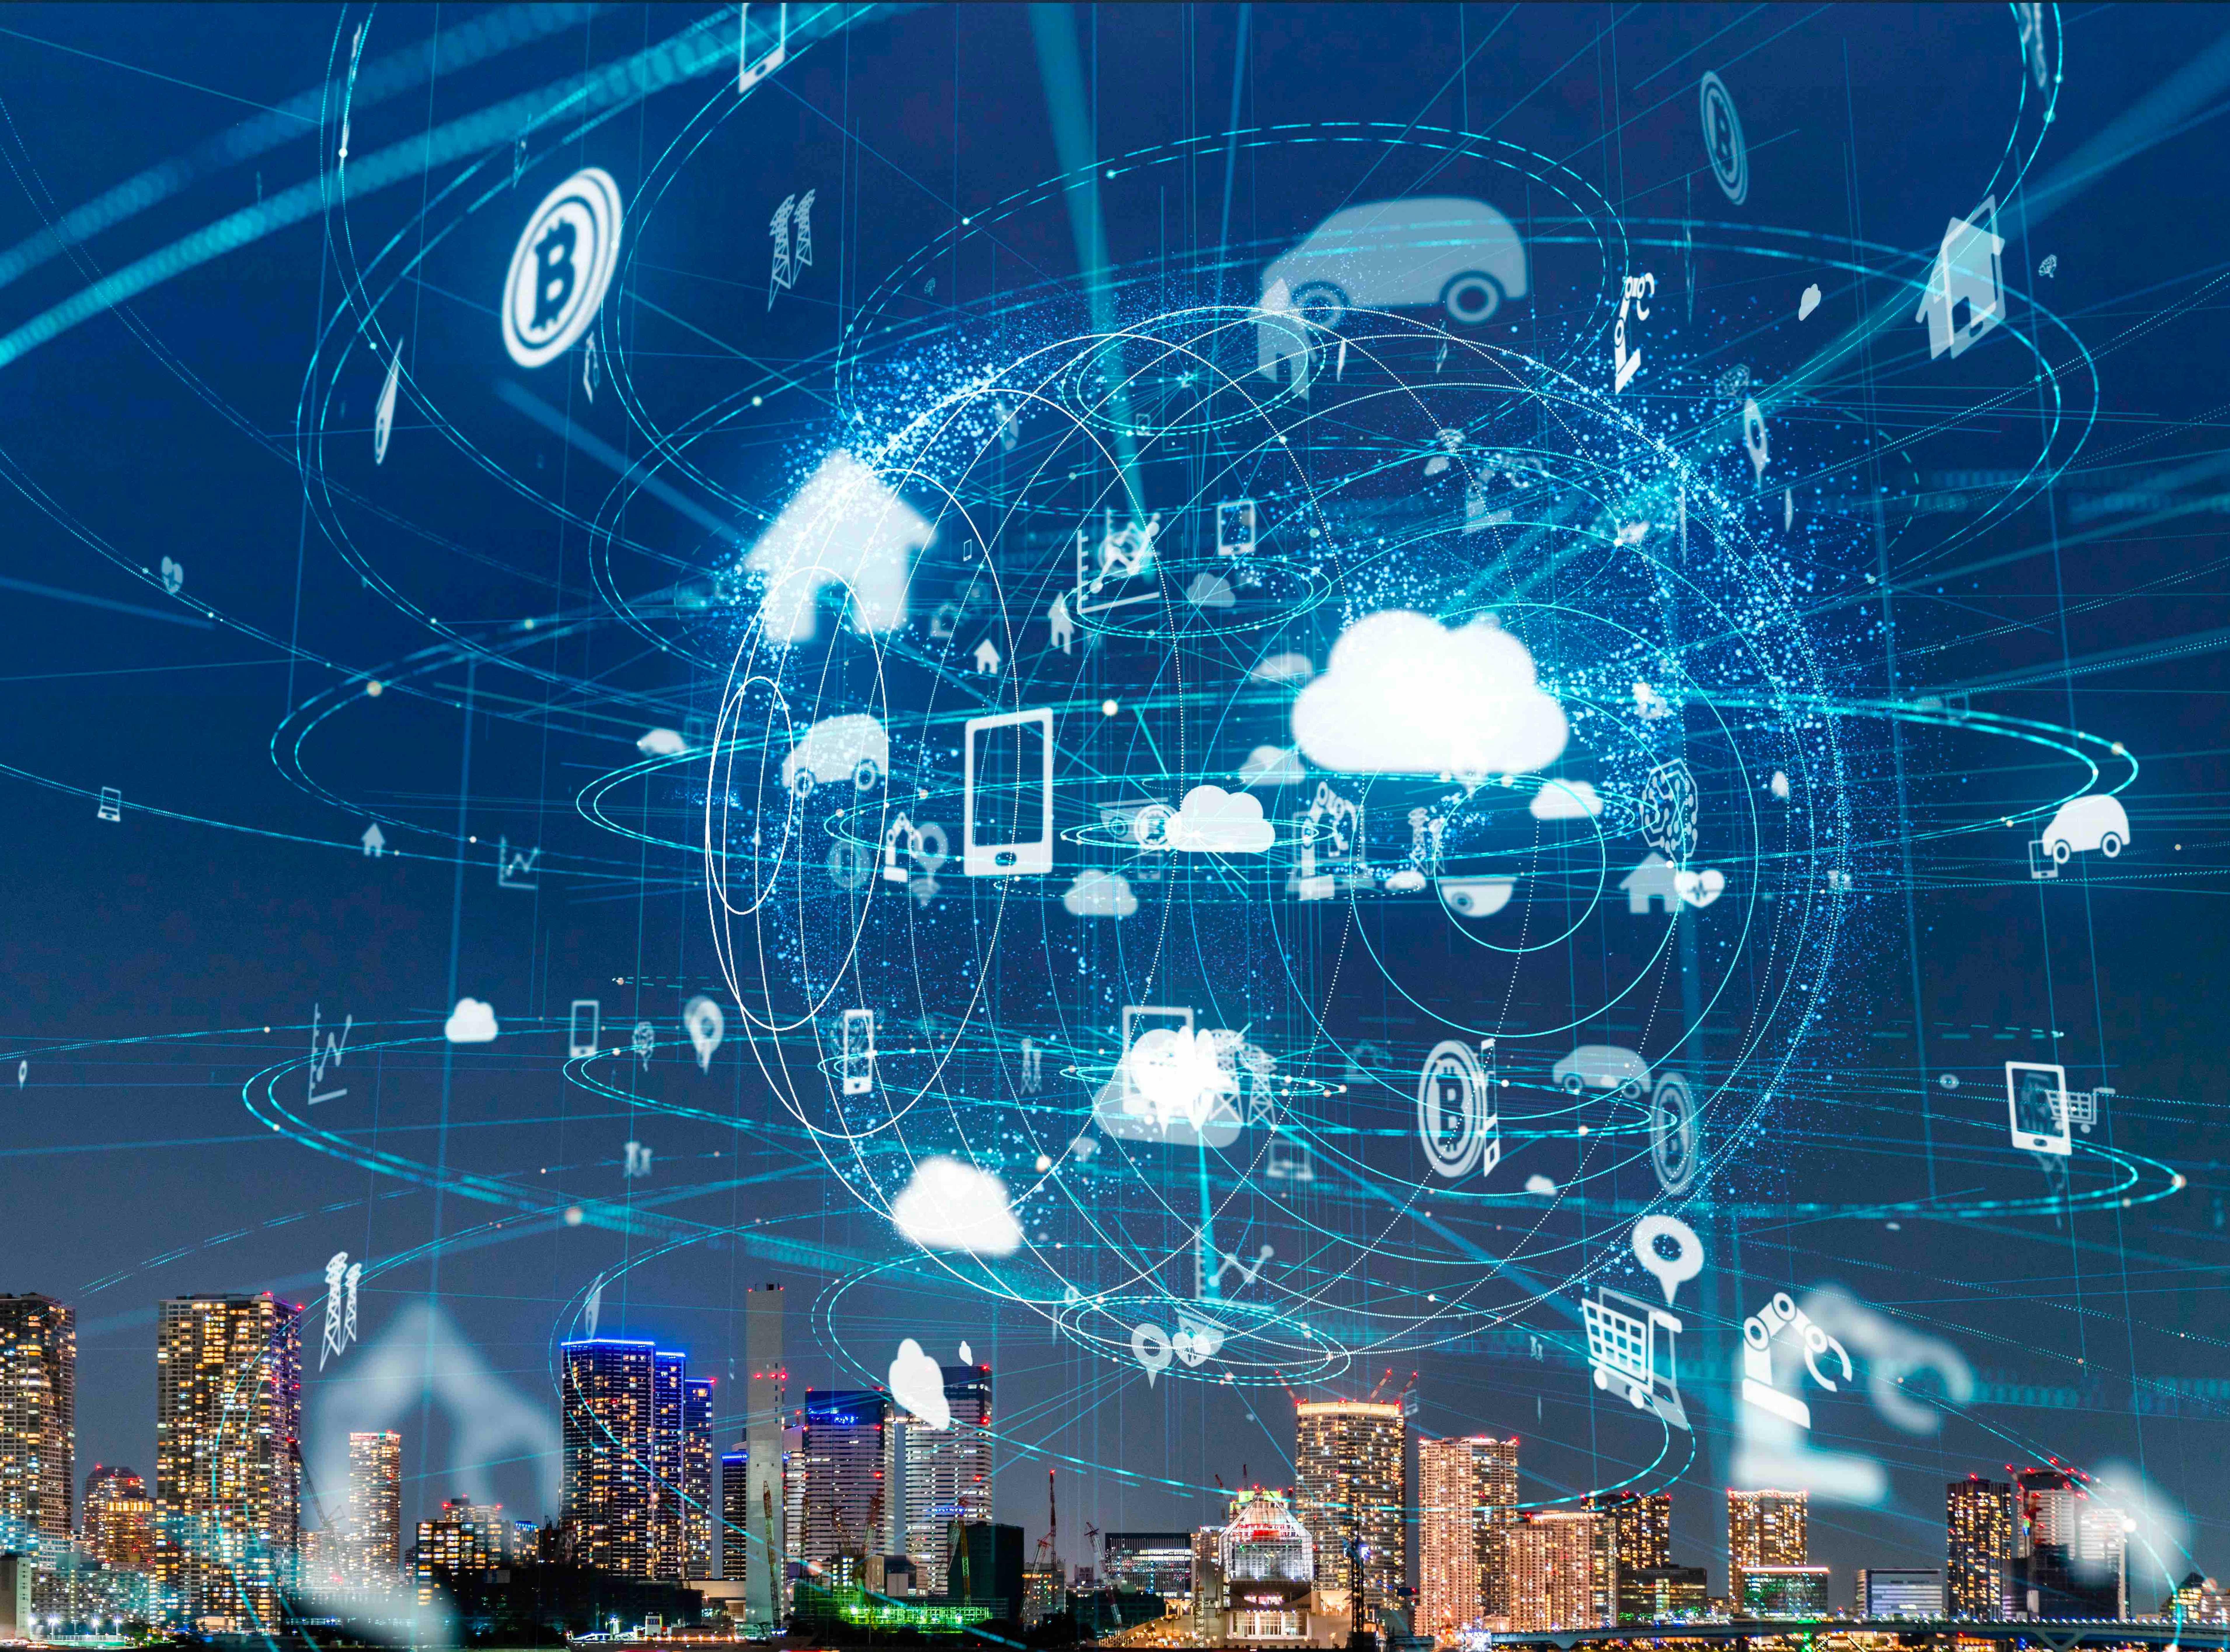 Accruent - Resources - Webinars - How IoT is Helping FM Post COVID-19, Series 3 of 3 - Hero